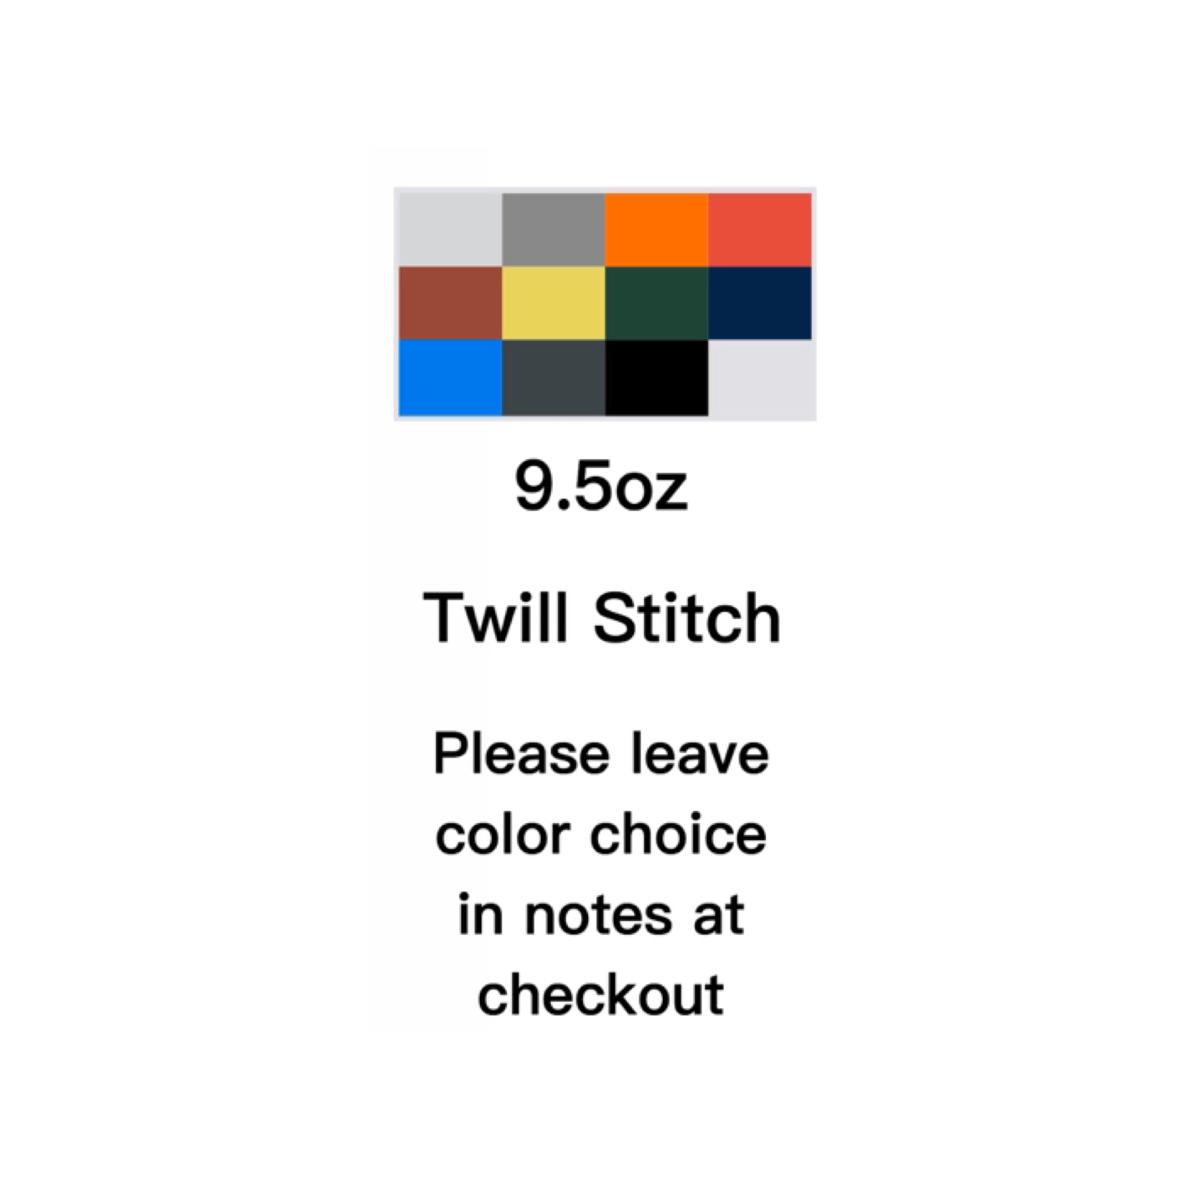 Image of KOS 9.5oz Twill Stitch Customers Choice